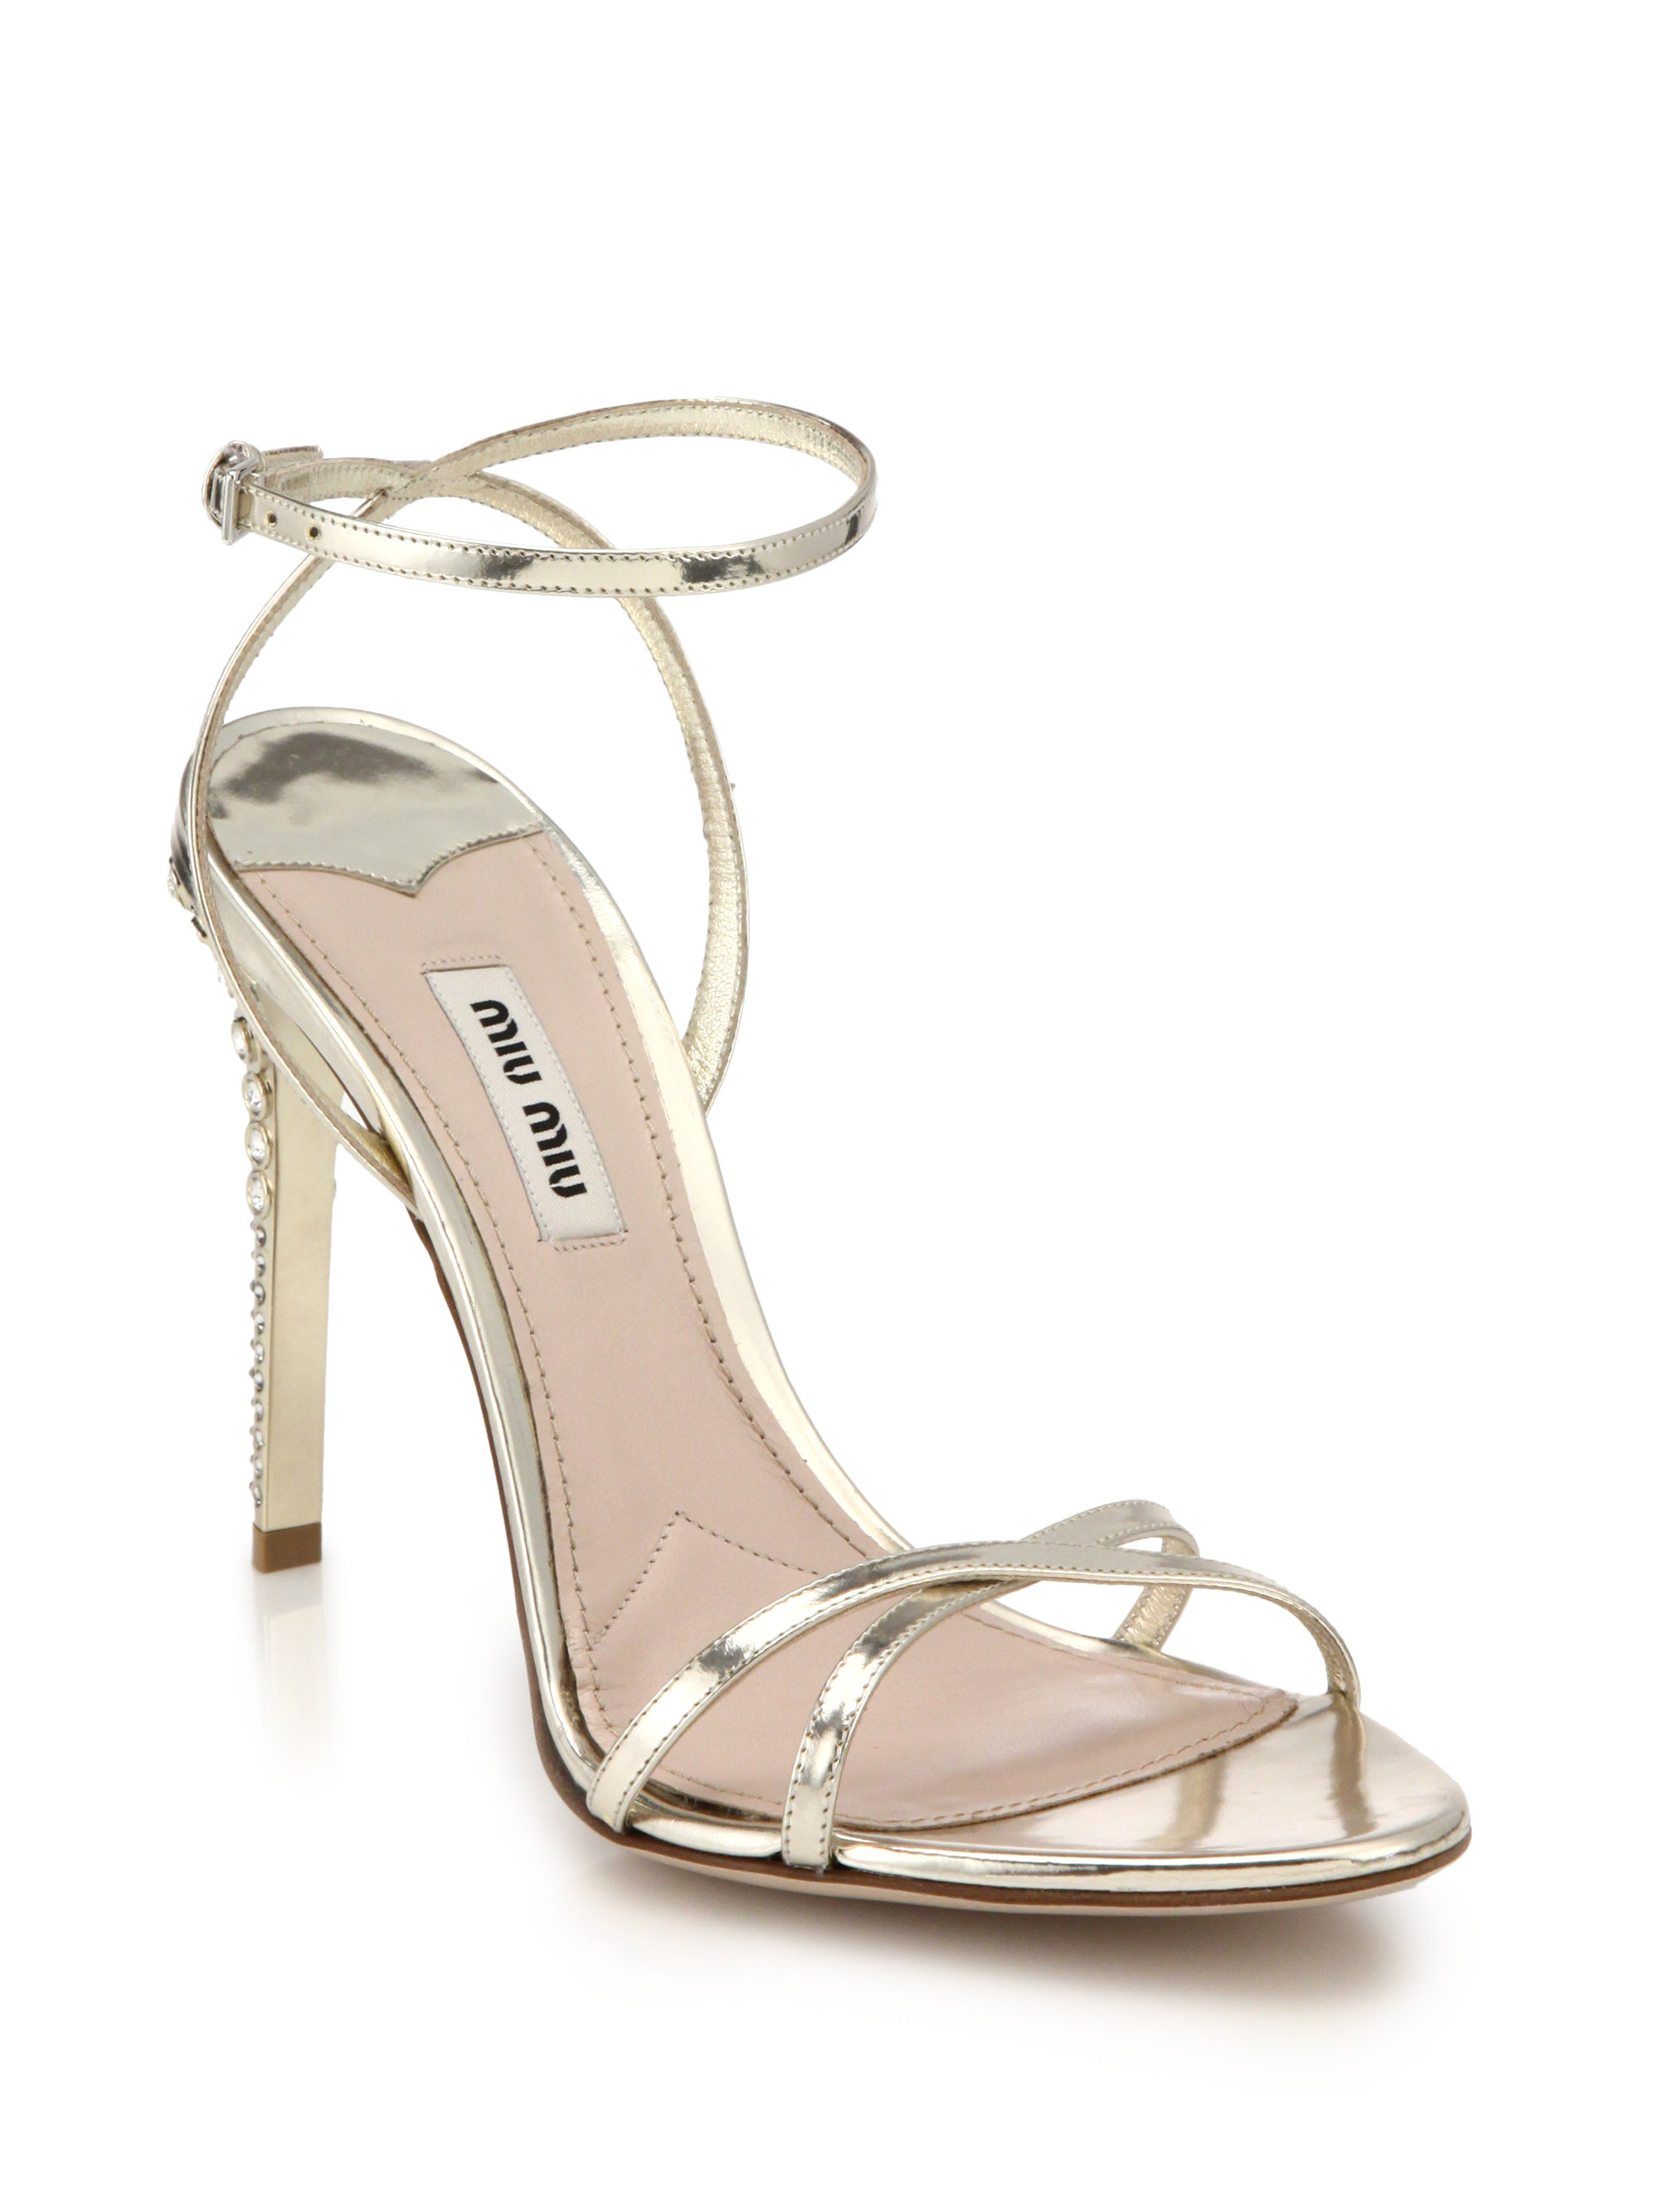 a6f148cdd Lyst - Miu Miu Swarovski Crystal-Heel Metallic Leather Sandals in ...